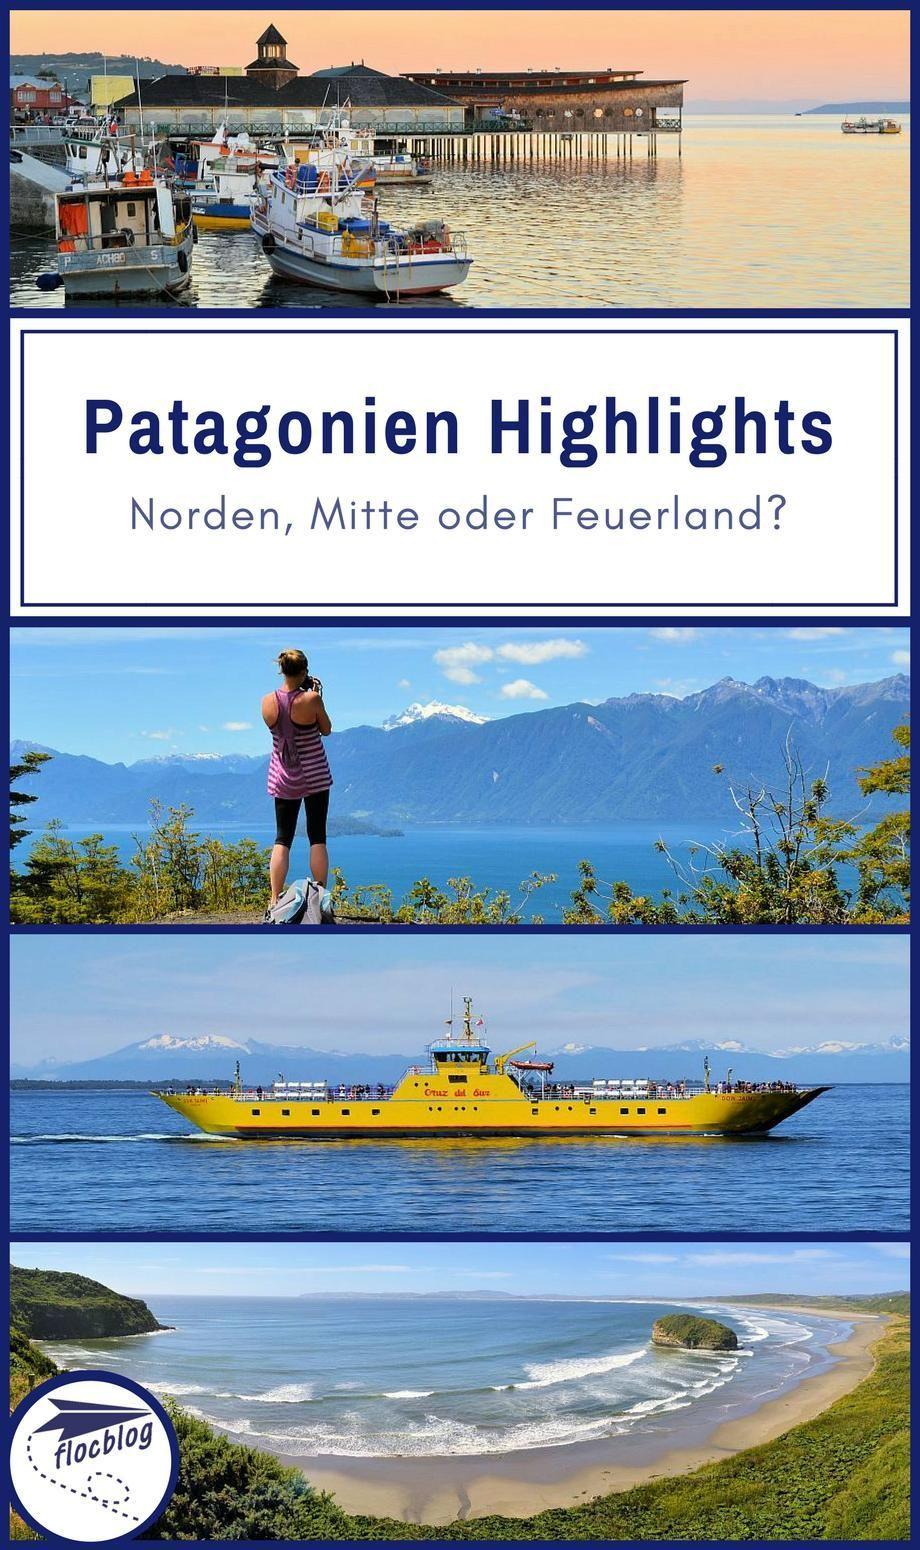 Patagonien Highlights Karte.Patagonien Highlights Norden Mitte Oder Feuerland Karte